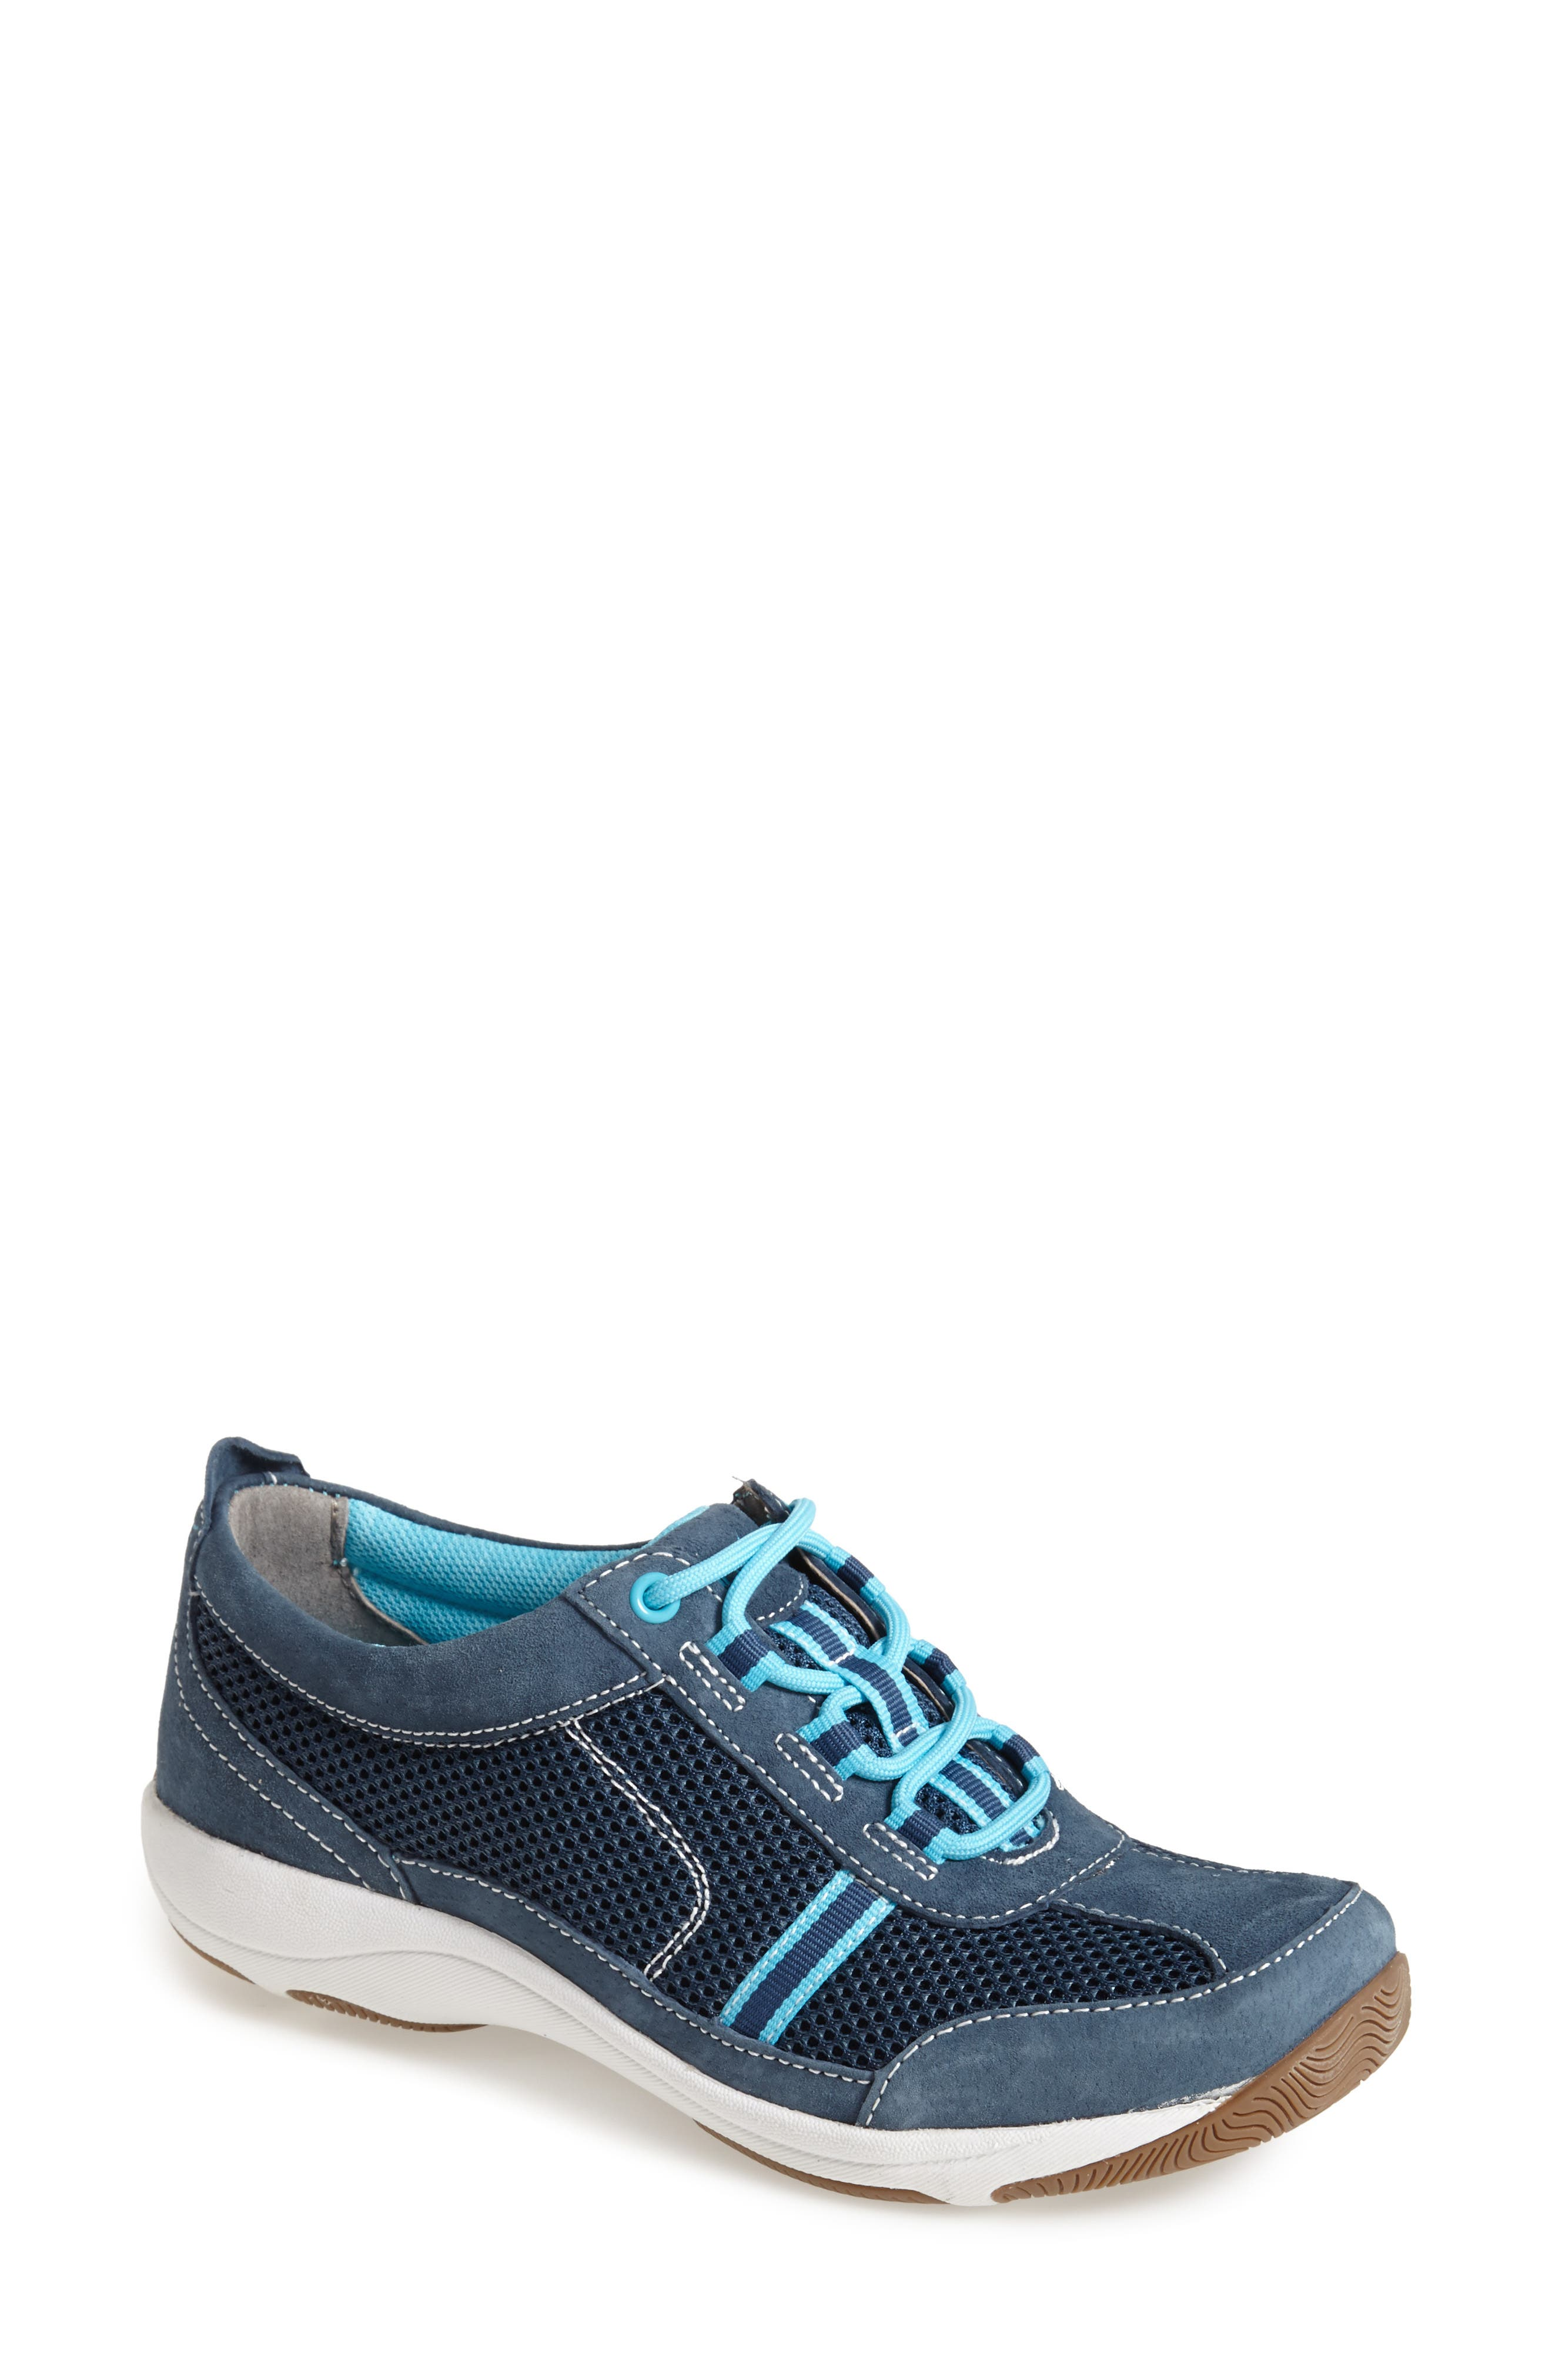 'Helen' Suede & Mesh Sneaker,                             Alternate thumbnail 41, color,